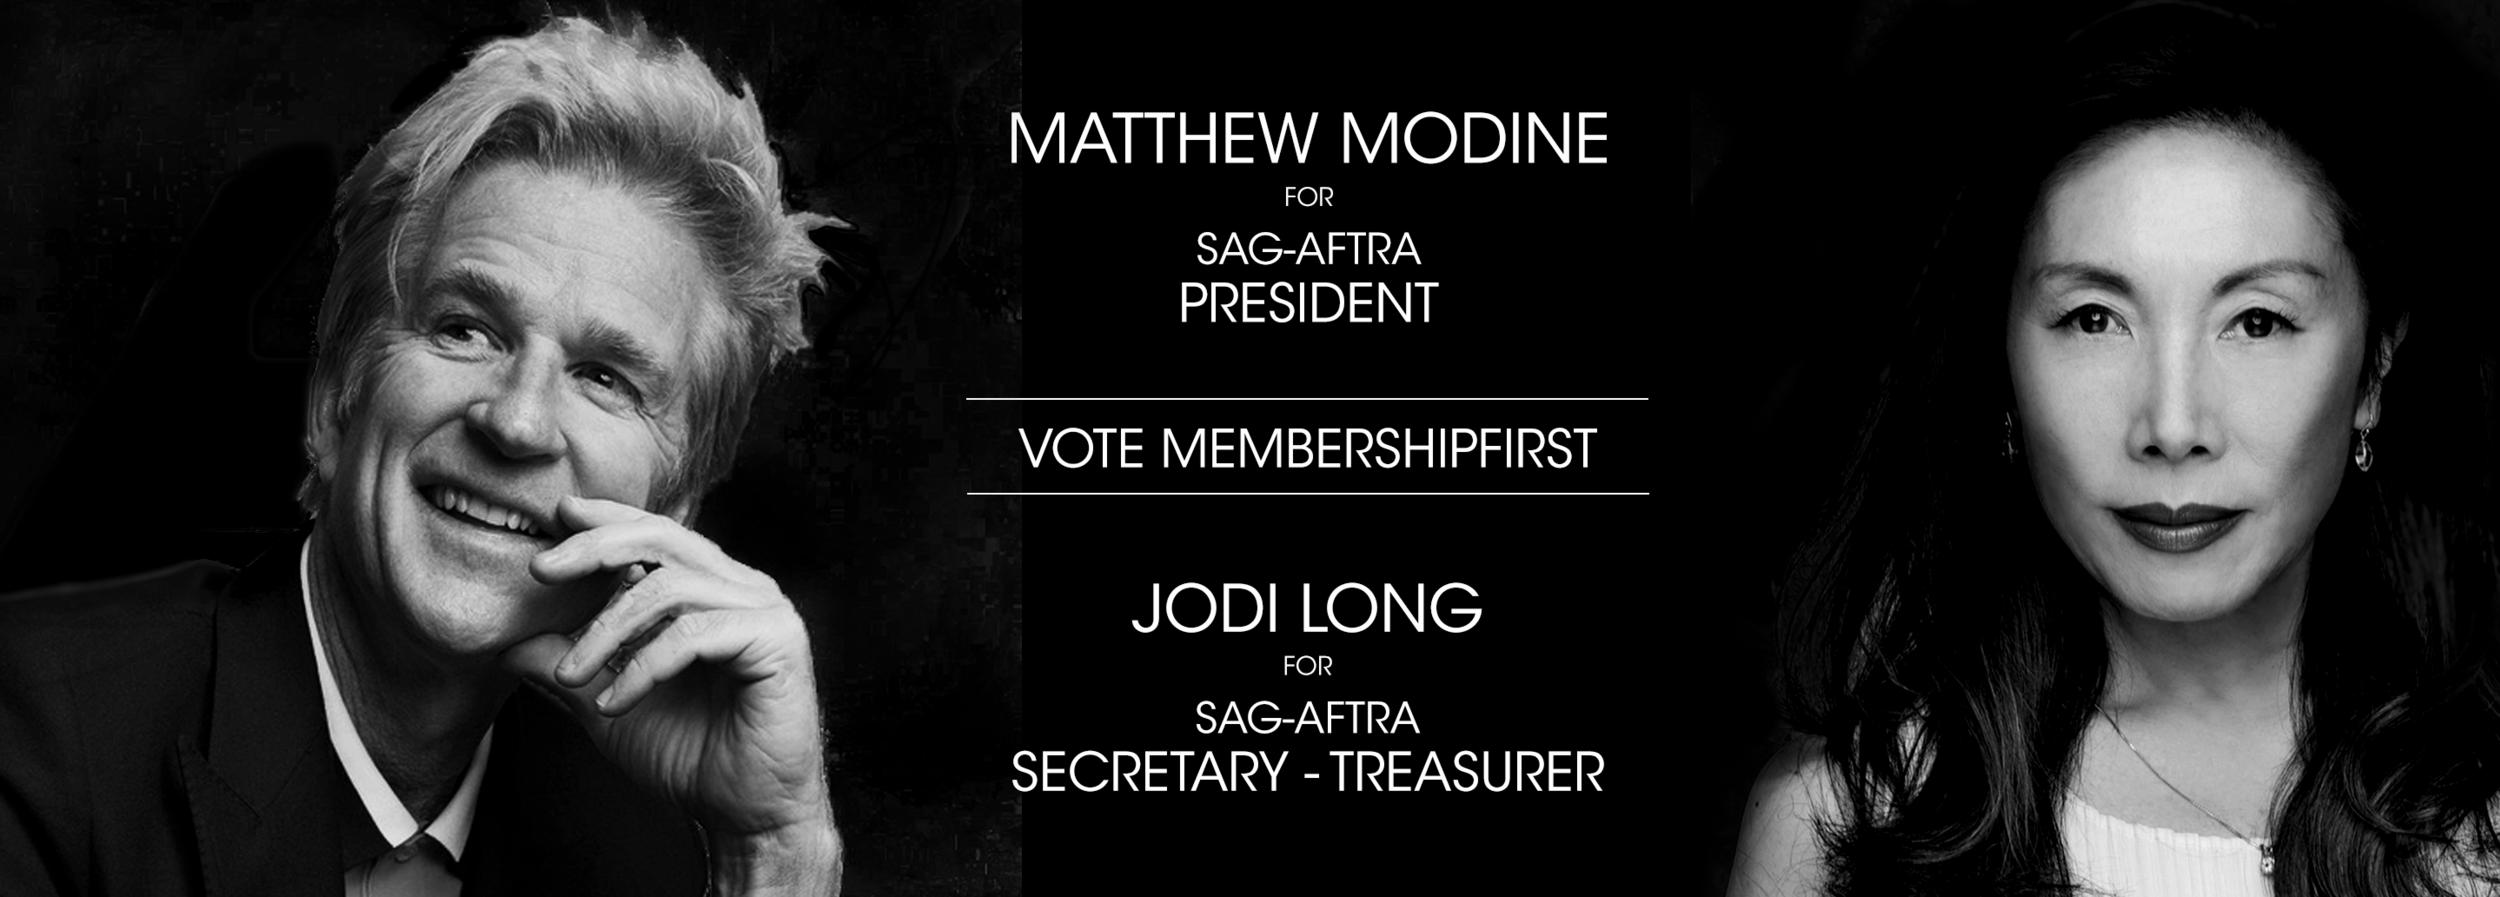 Matthew Modine Jodi Long SAGAFTRA MembershipFirst